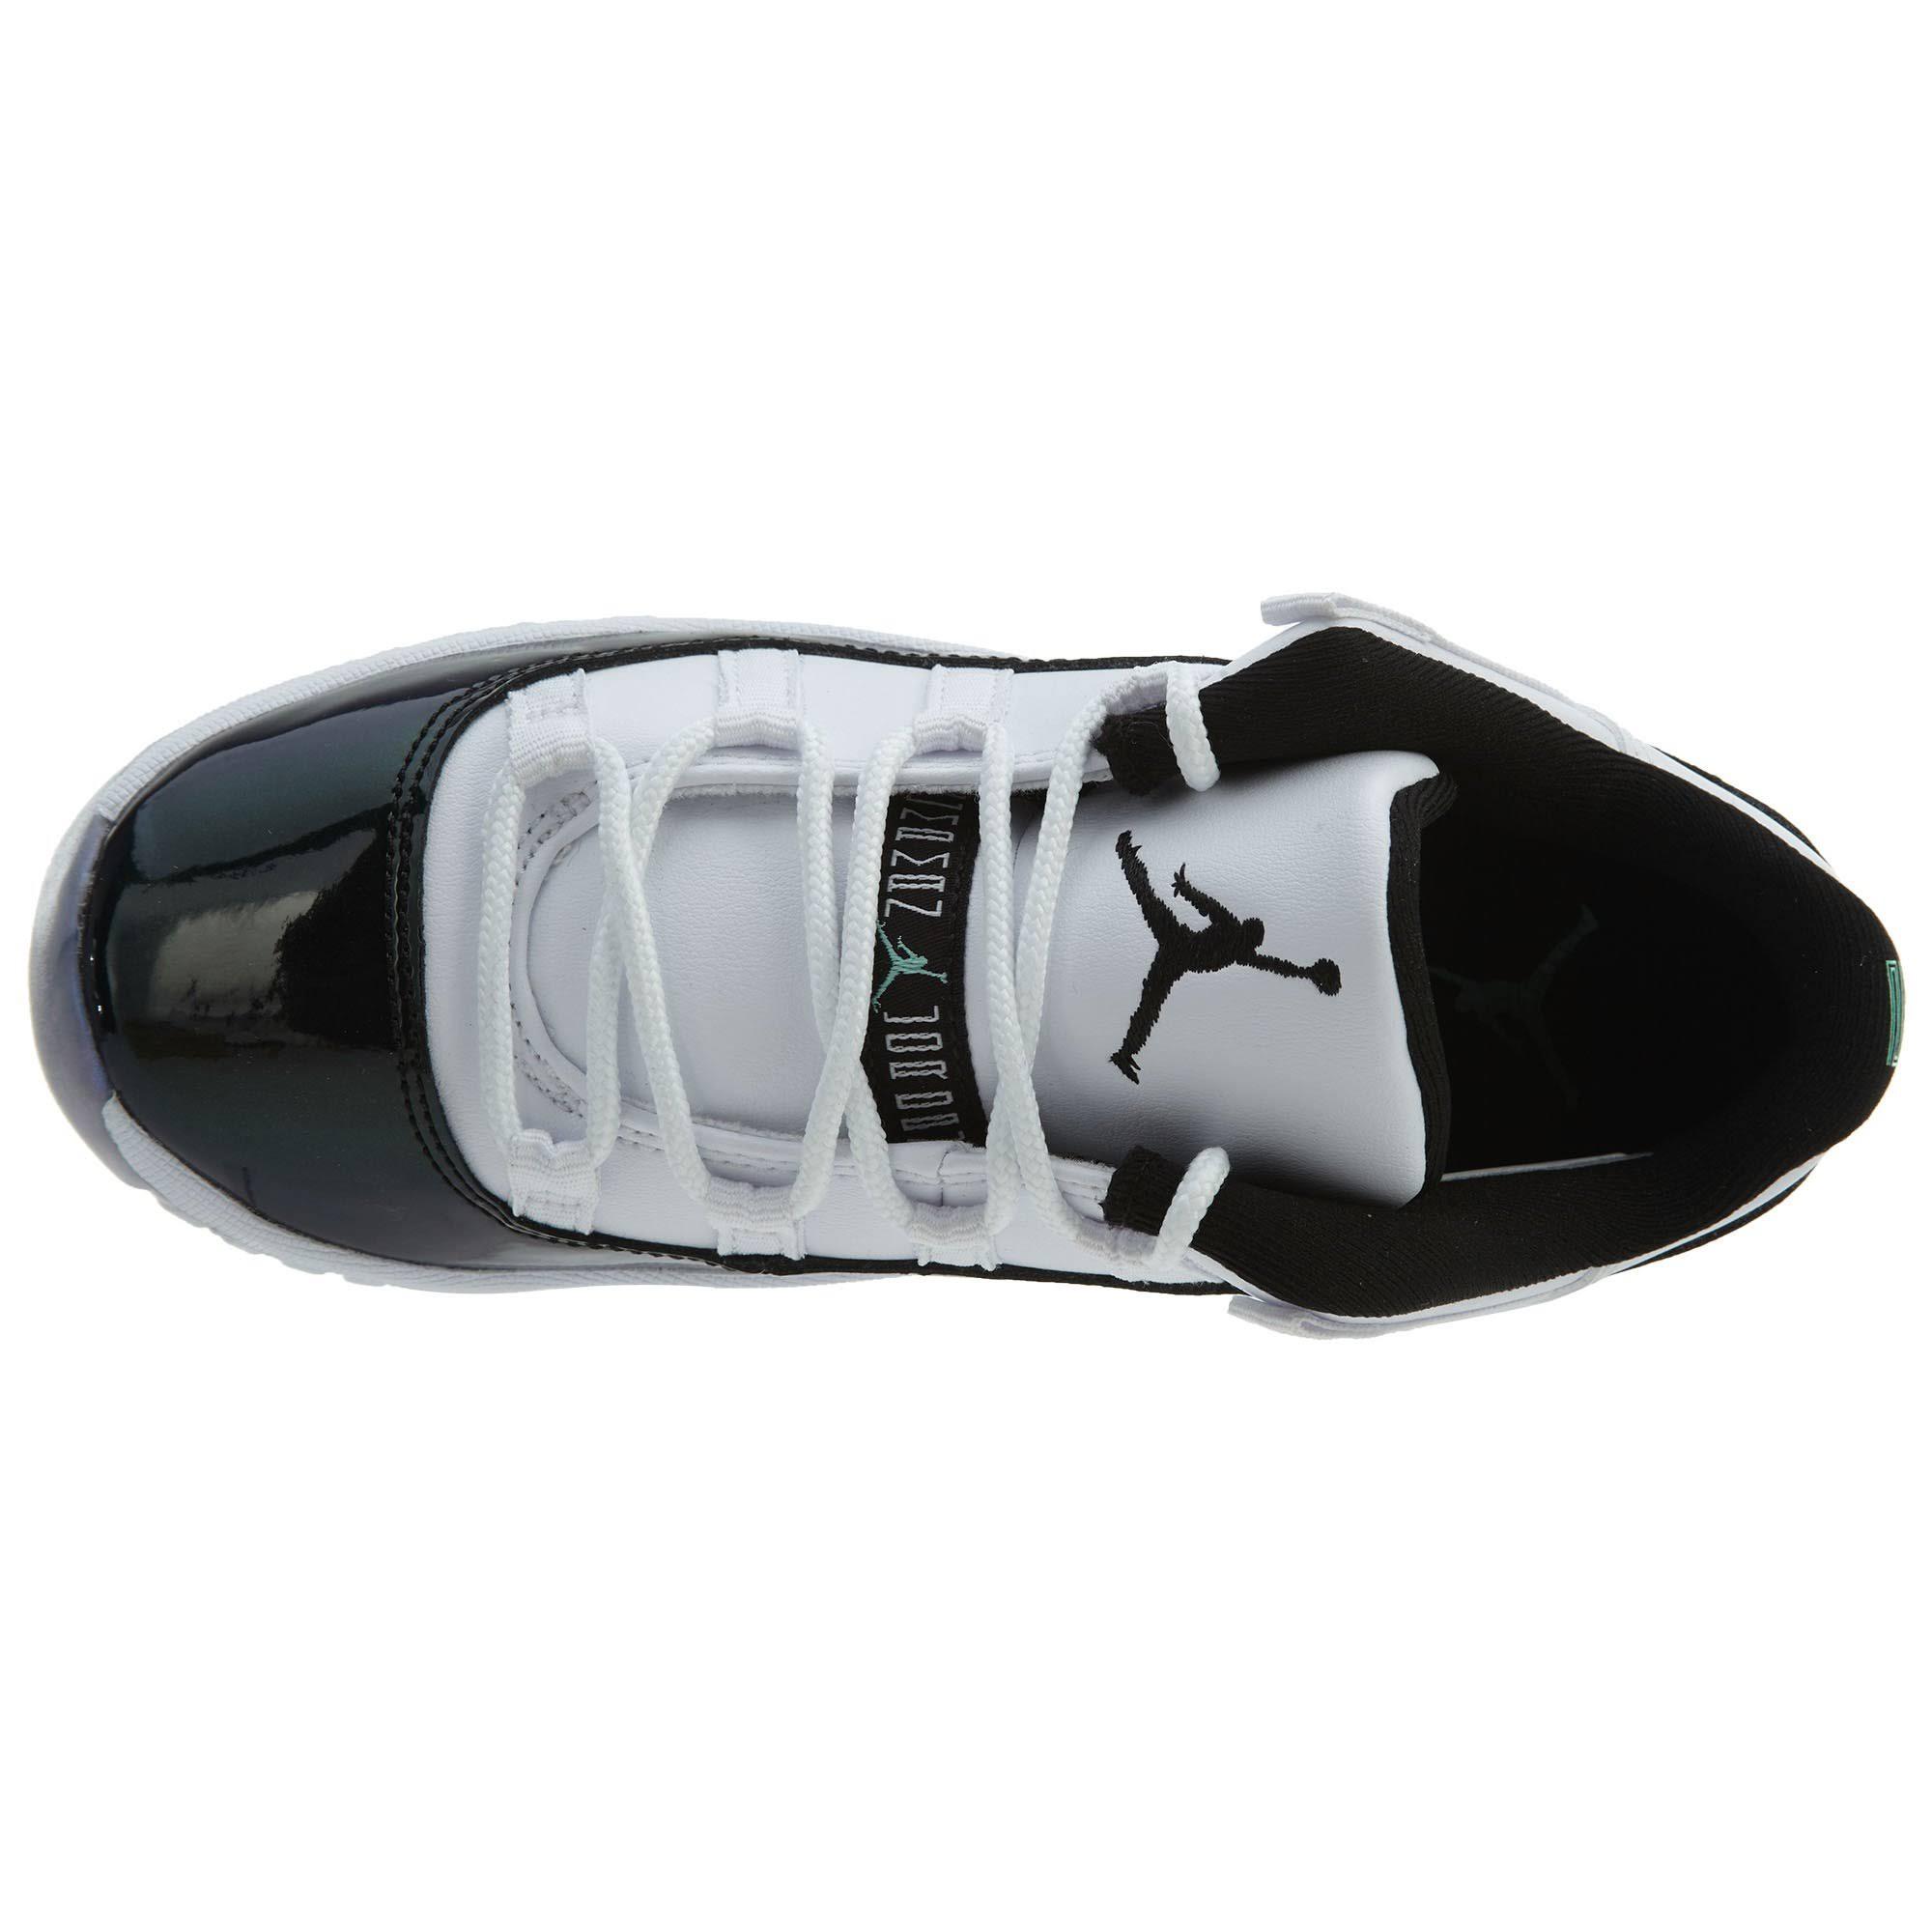 Jordan Bajo Negro 11 5 Esmeralda Blanco Aumento esmeralda Negro Iridiscente 1 Retro rfxgdnf